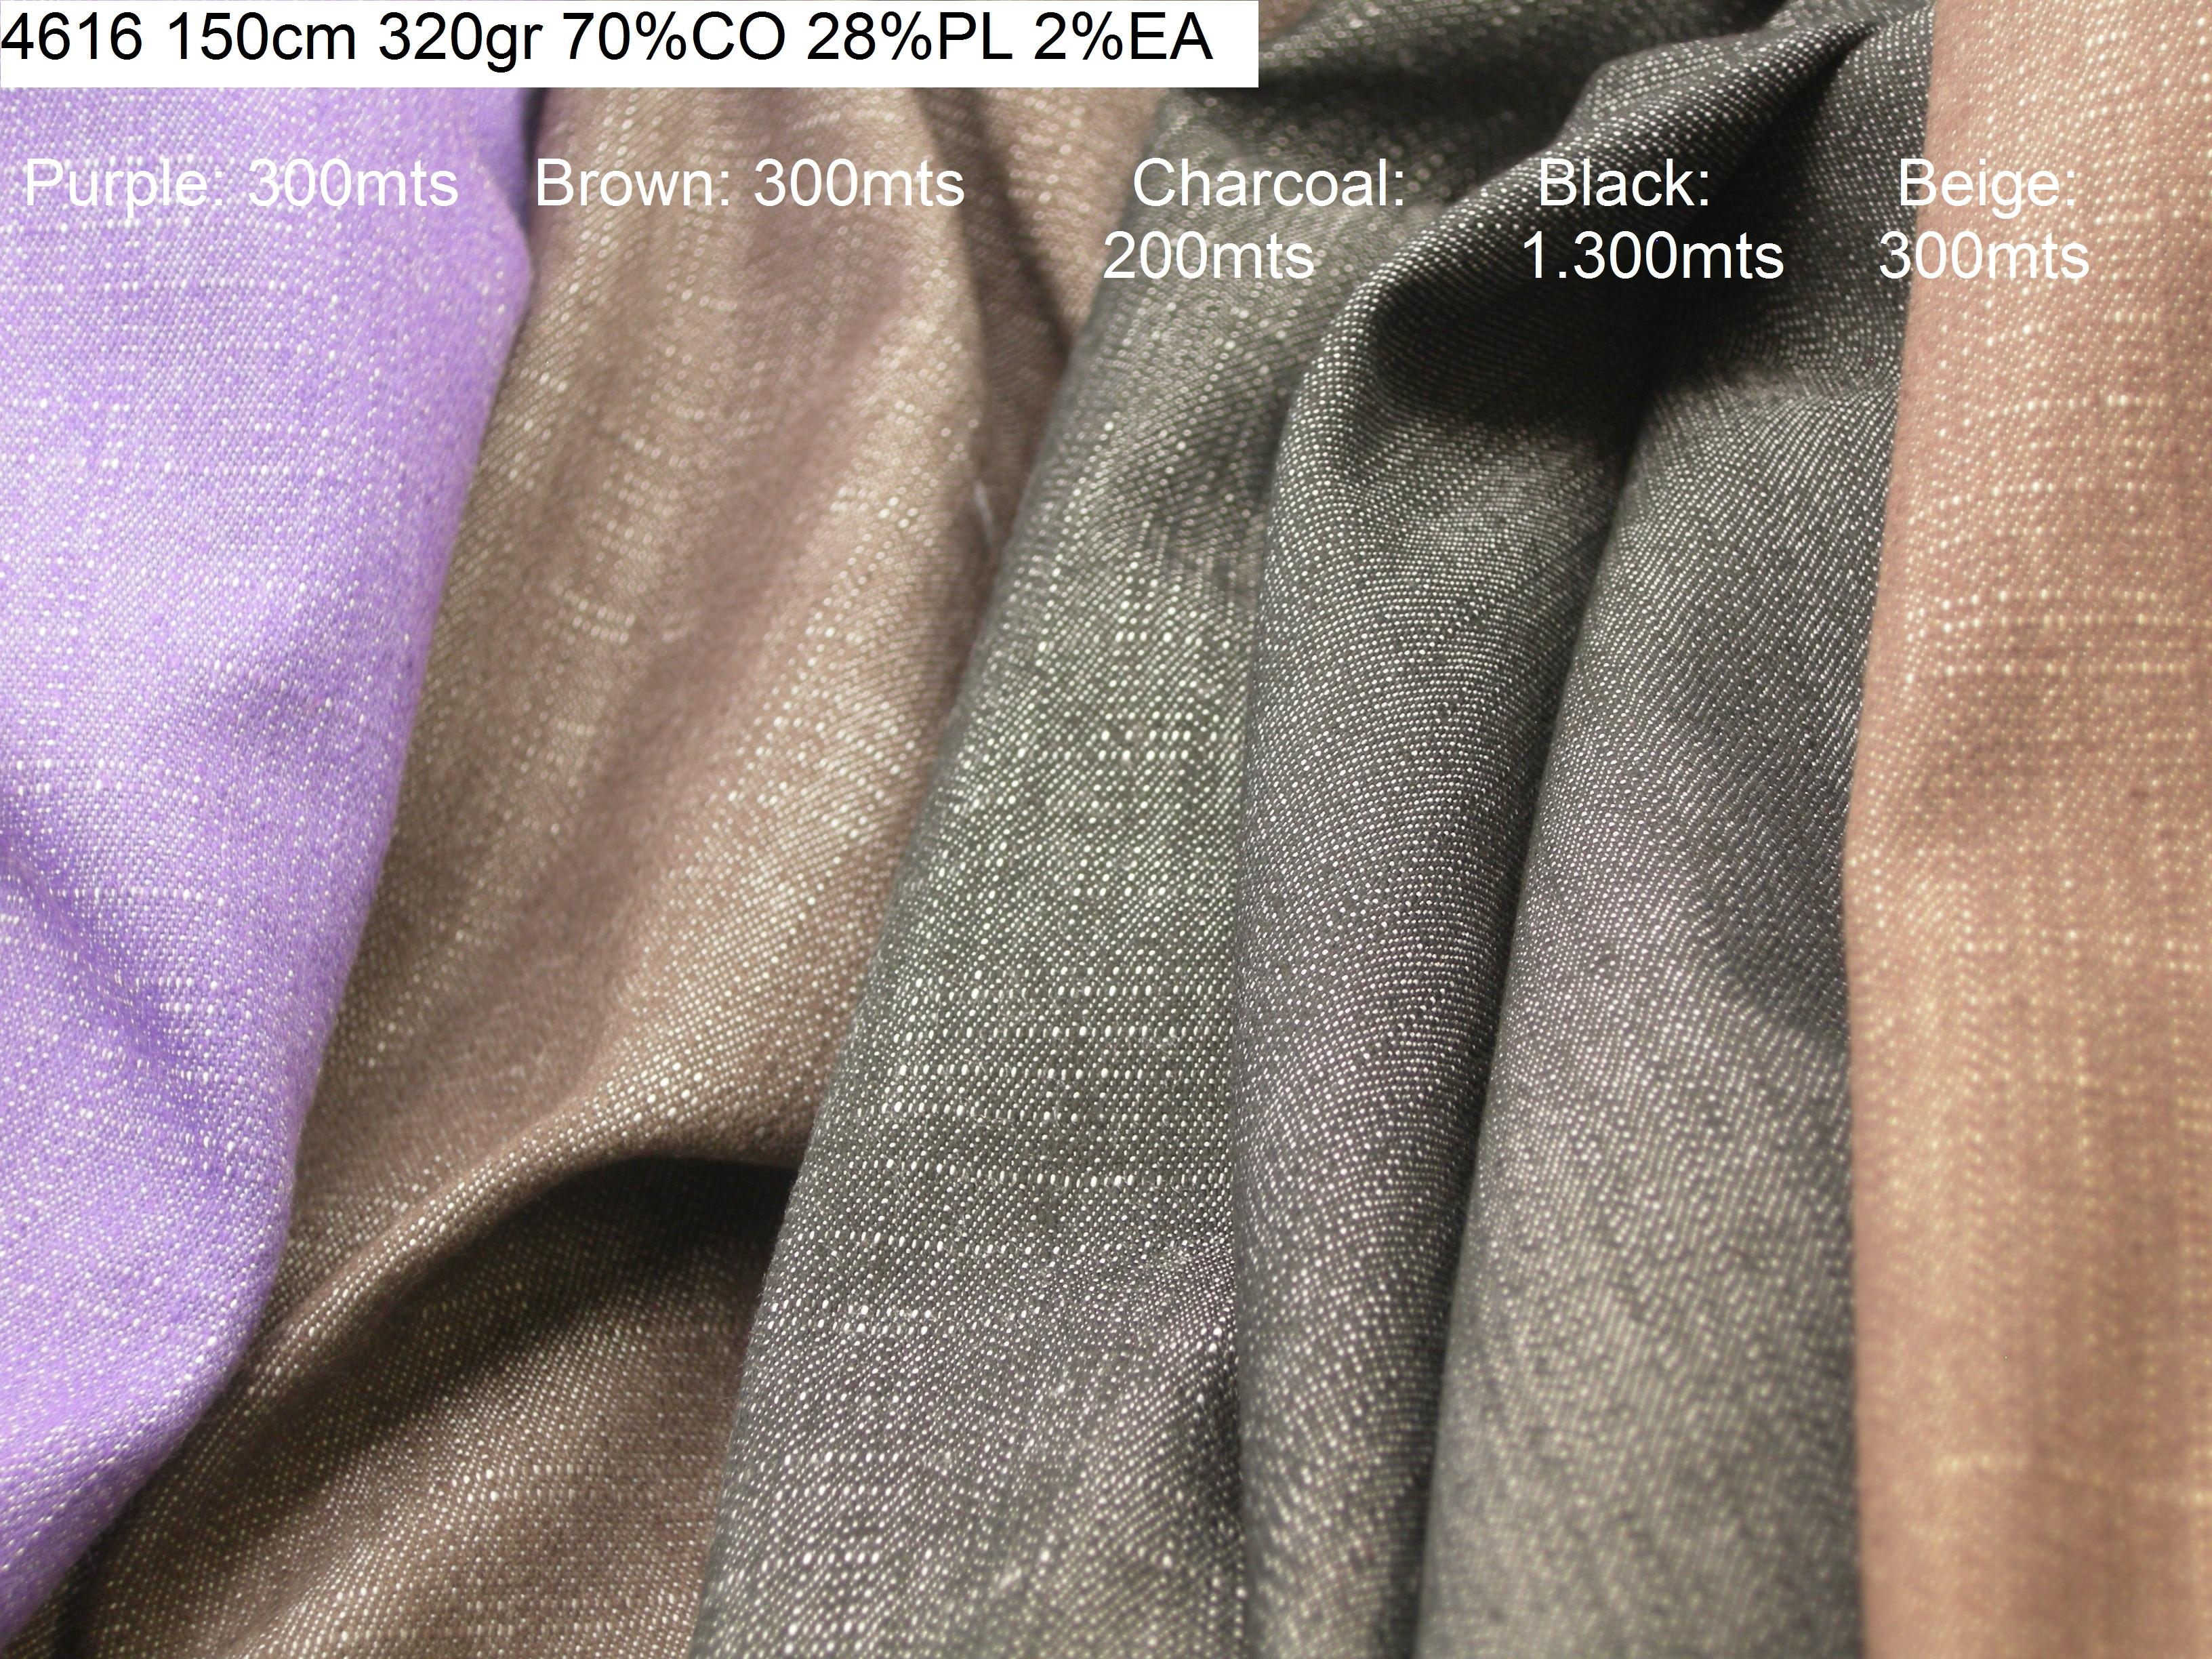 4616 stretch comfort jeans denim shantung pants jacket fabric